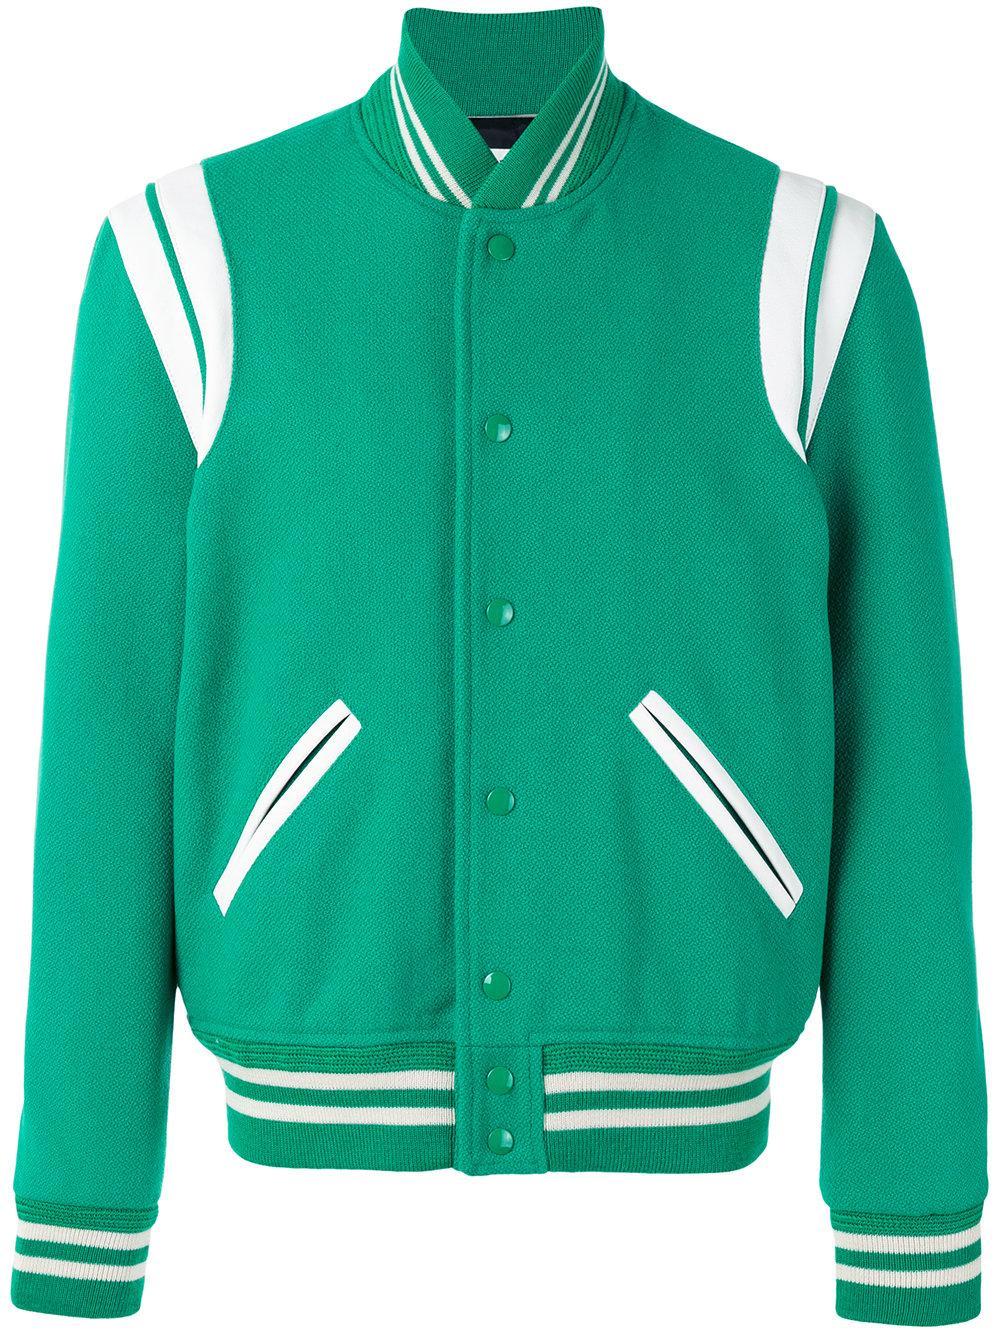 Saint Laurent Teddy Varsity Jacket In Green For Men Lyst